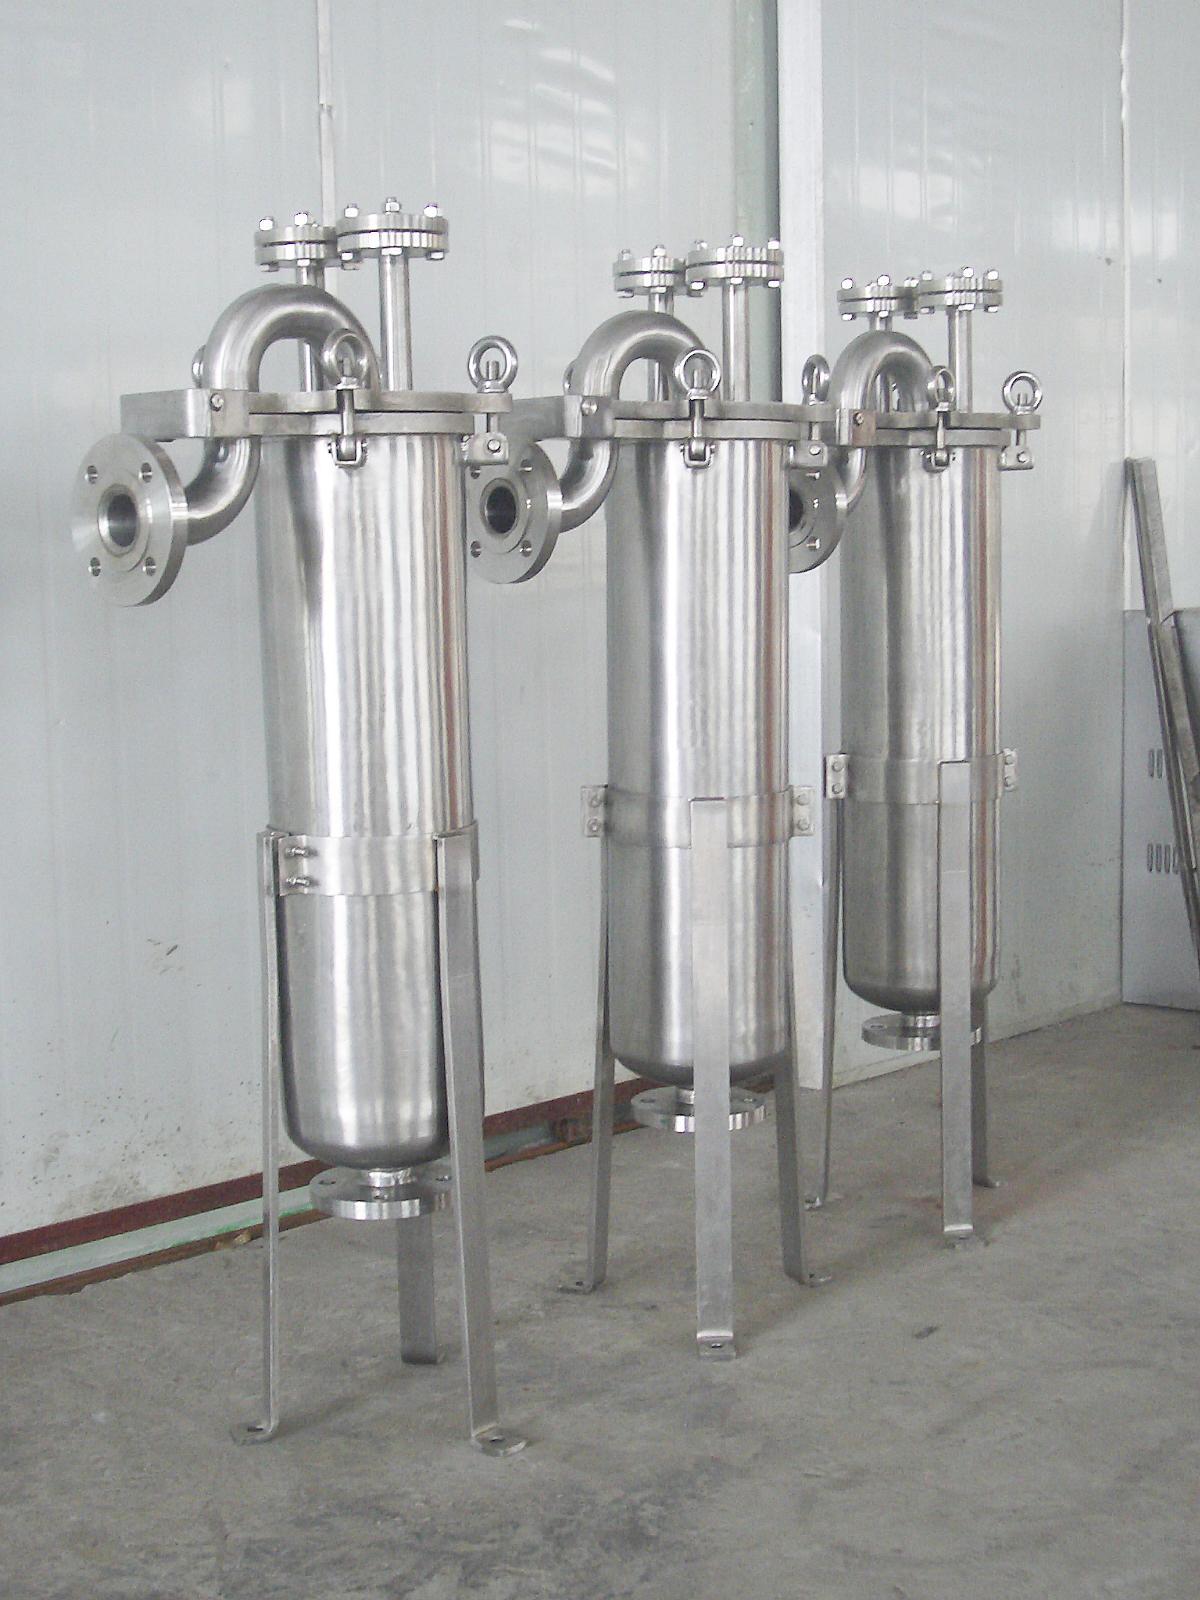 904L是一種含炭量很低的高合金化的奧氏體不銹鋼,是為腐蝕條件苛刻的環境所設計的,具有良好的抗點腐蝕和縫隙腐蝕的能力、抗應力腐蝕破裂的能力、抗晶間腐蝕能力、可加工性和可焊性。主要應用在高溫、高壓,且含腐蝕性物質的嚴酷環境中,如石油、石化設備中的反應器,硫酸的儲存與運輸設備、熱交換器,發電廠煙氣脫硫裝置,有機酸處理系統中的洗滌器和風扇等。